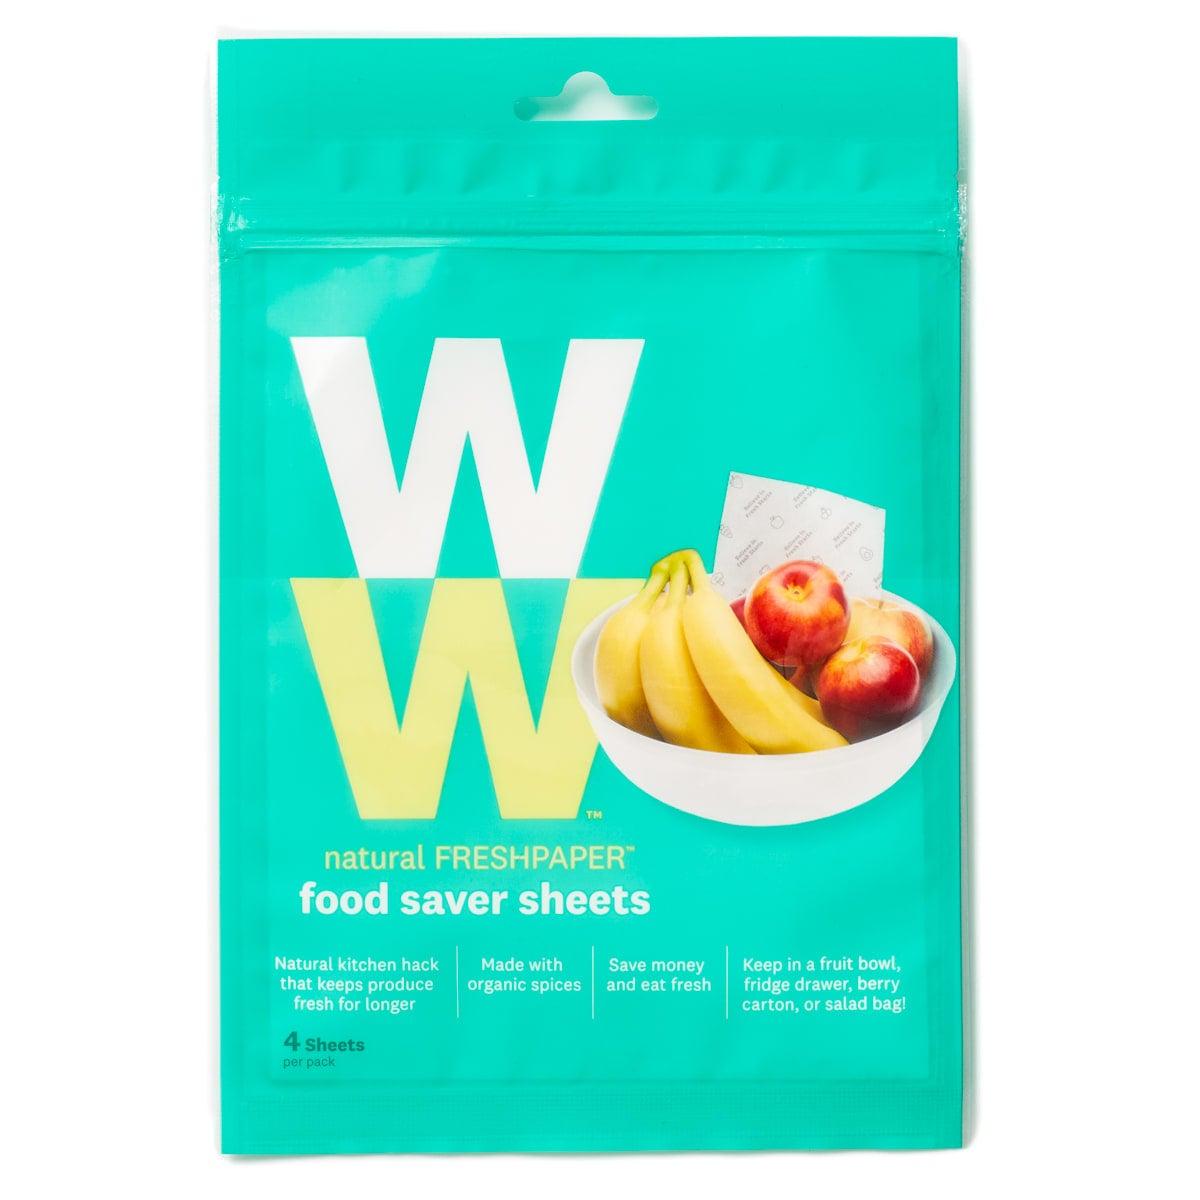 WW FRESHPAPER Food Saver Sheets